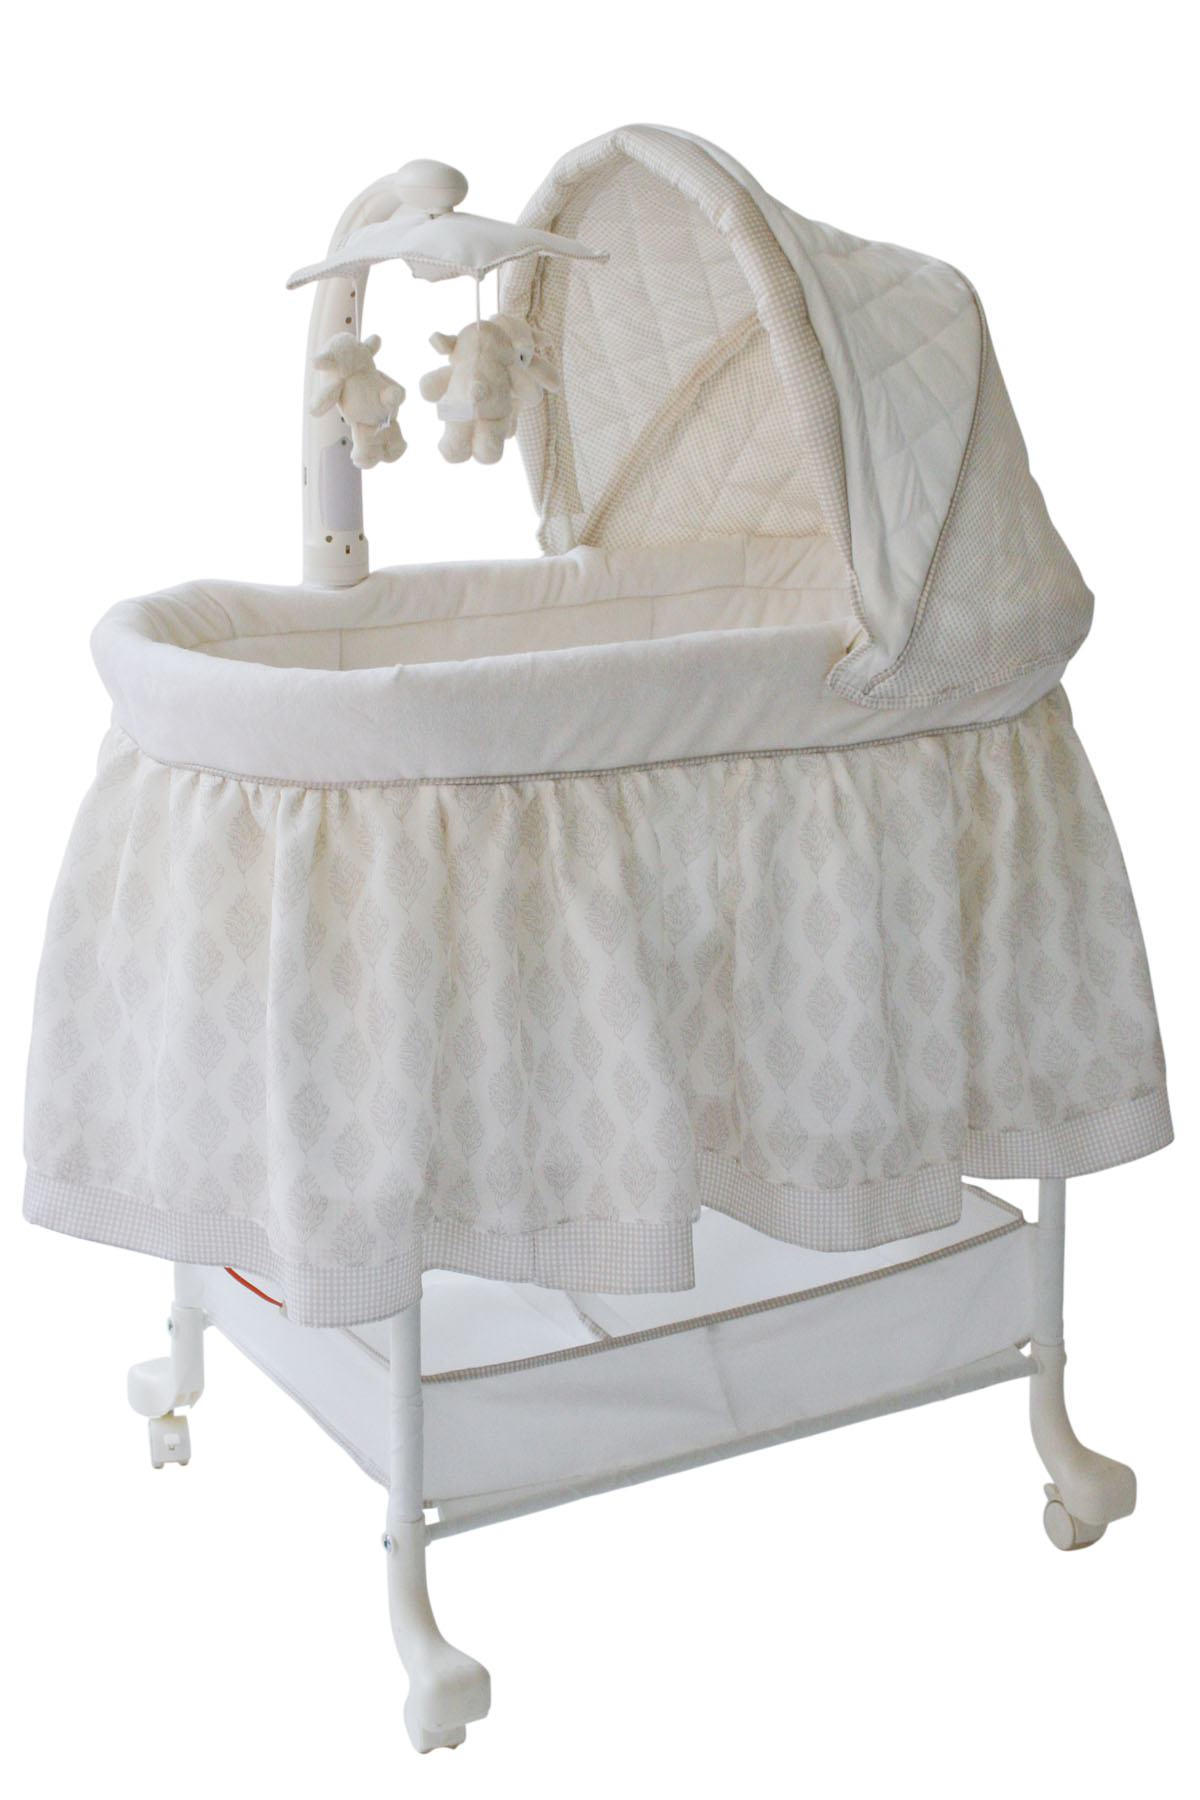 baby bassinet delta children gliding bassinet OBSHYZF